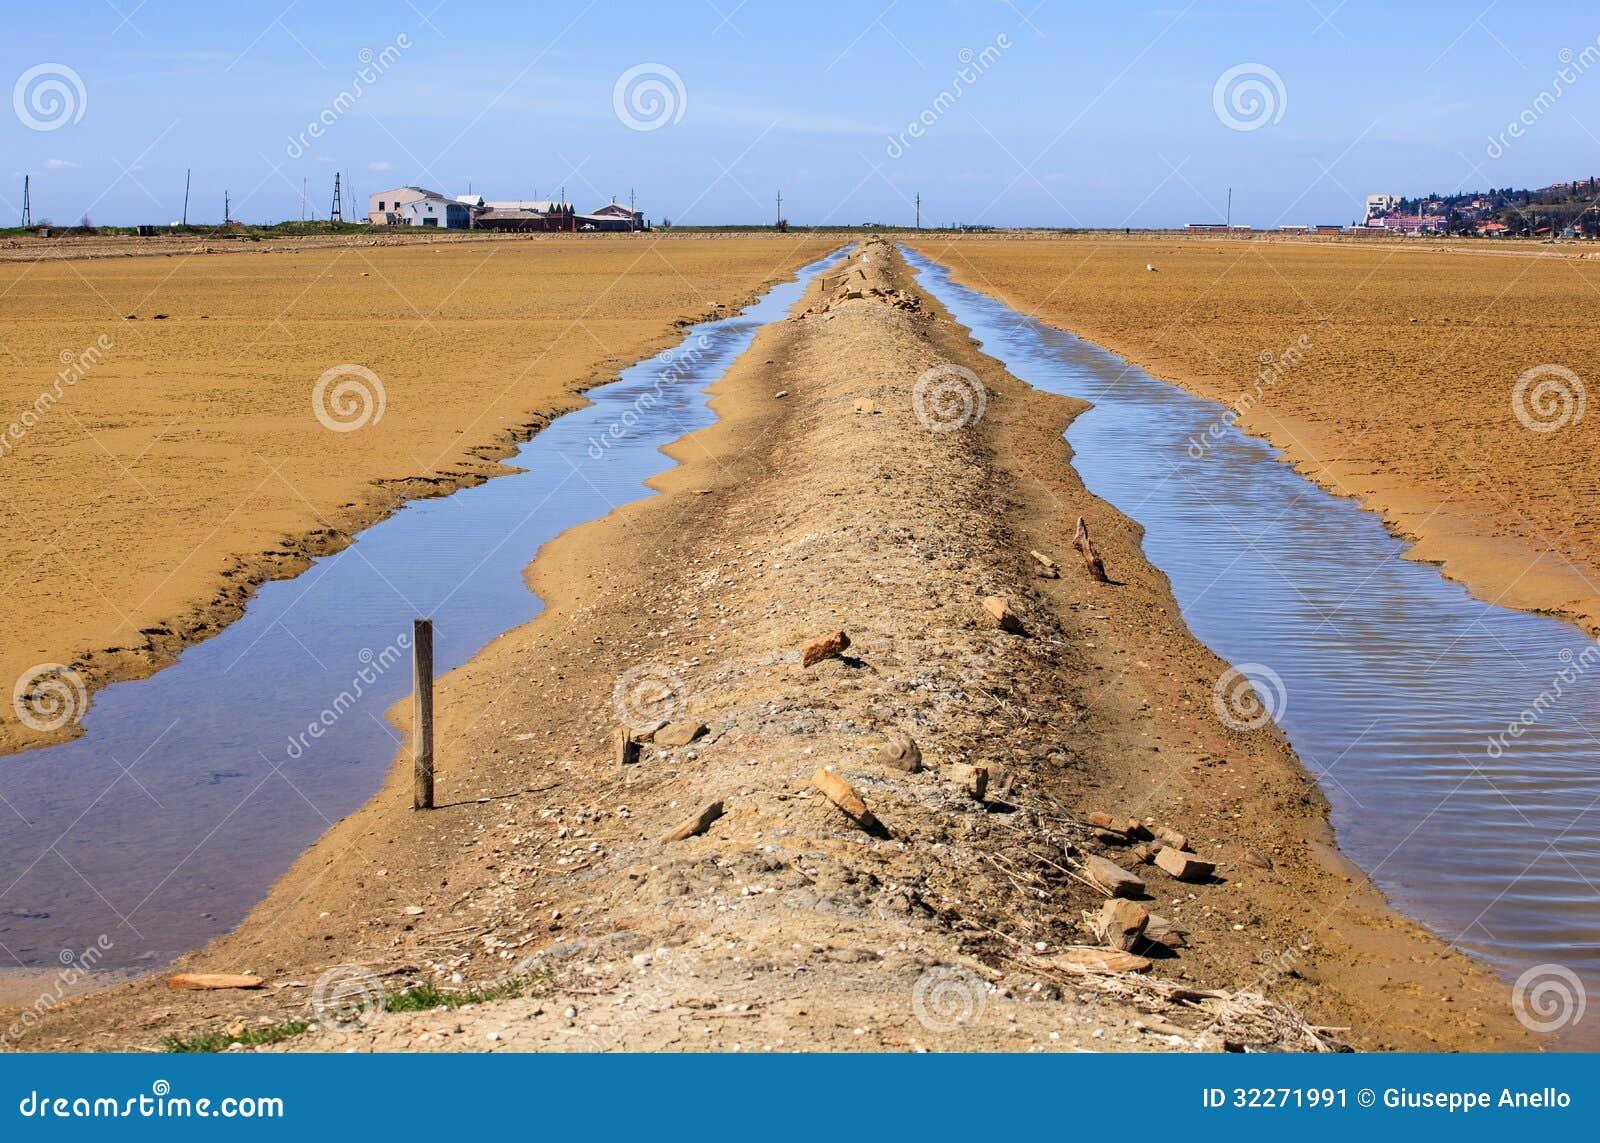 View of salt evaporation ponds in secovlje stock image for Design of evaporation pond